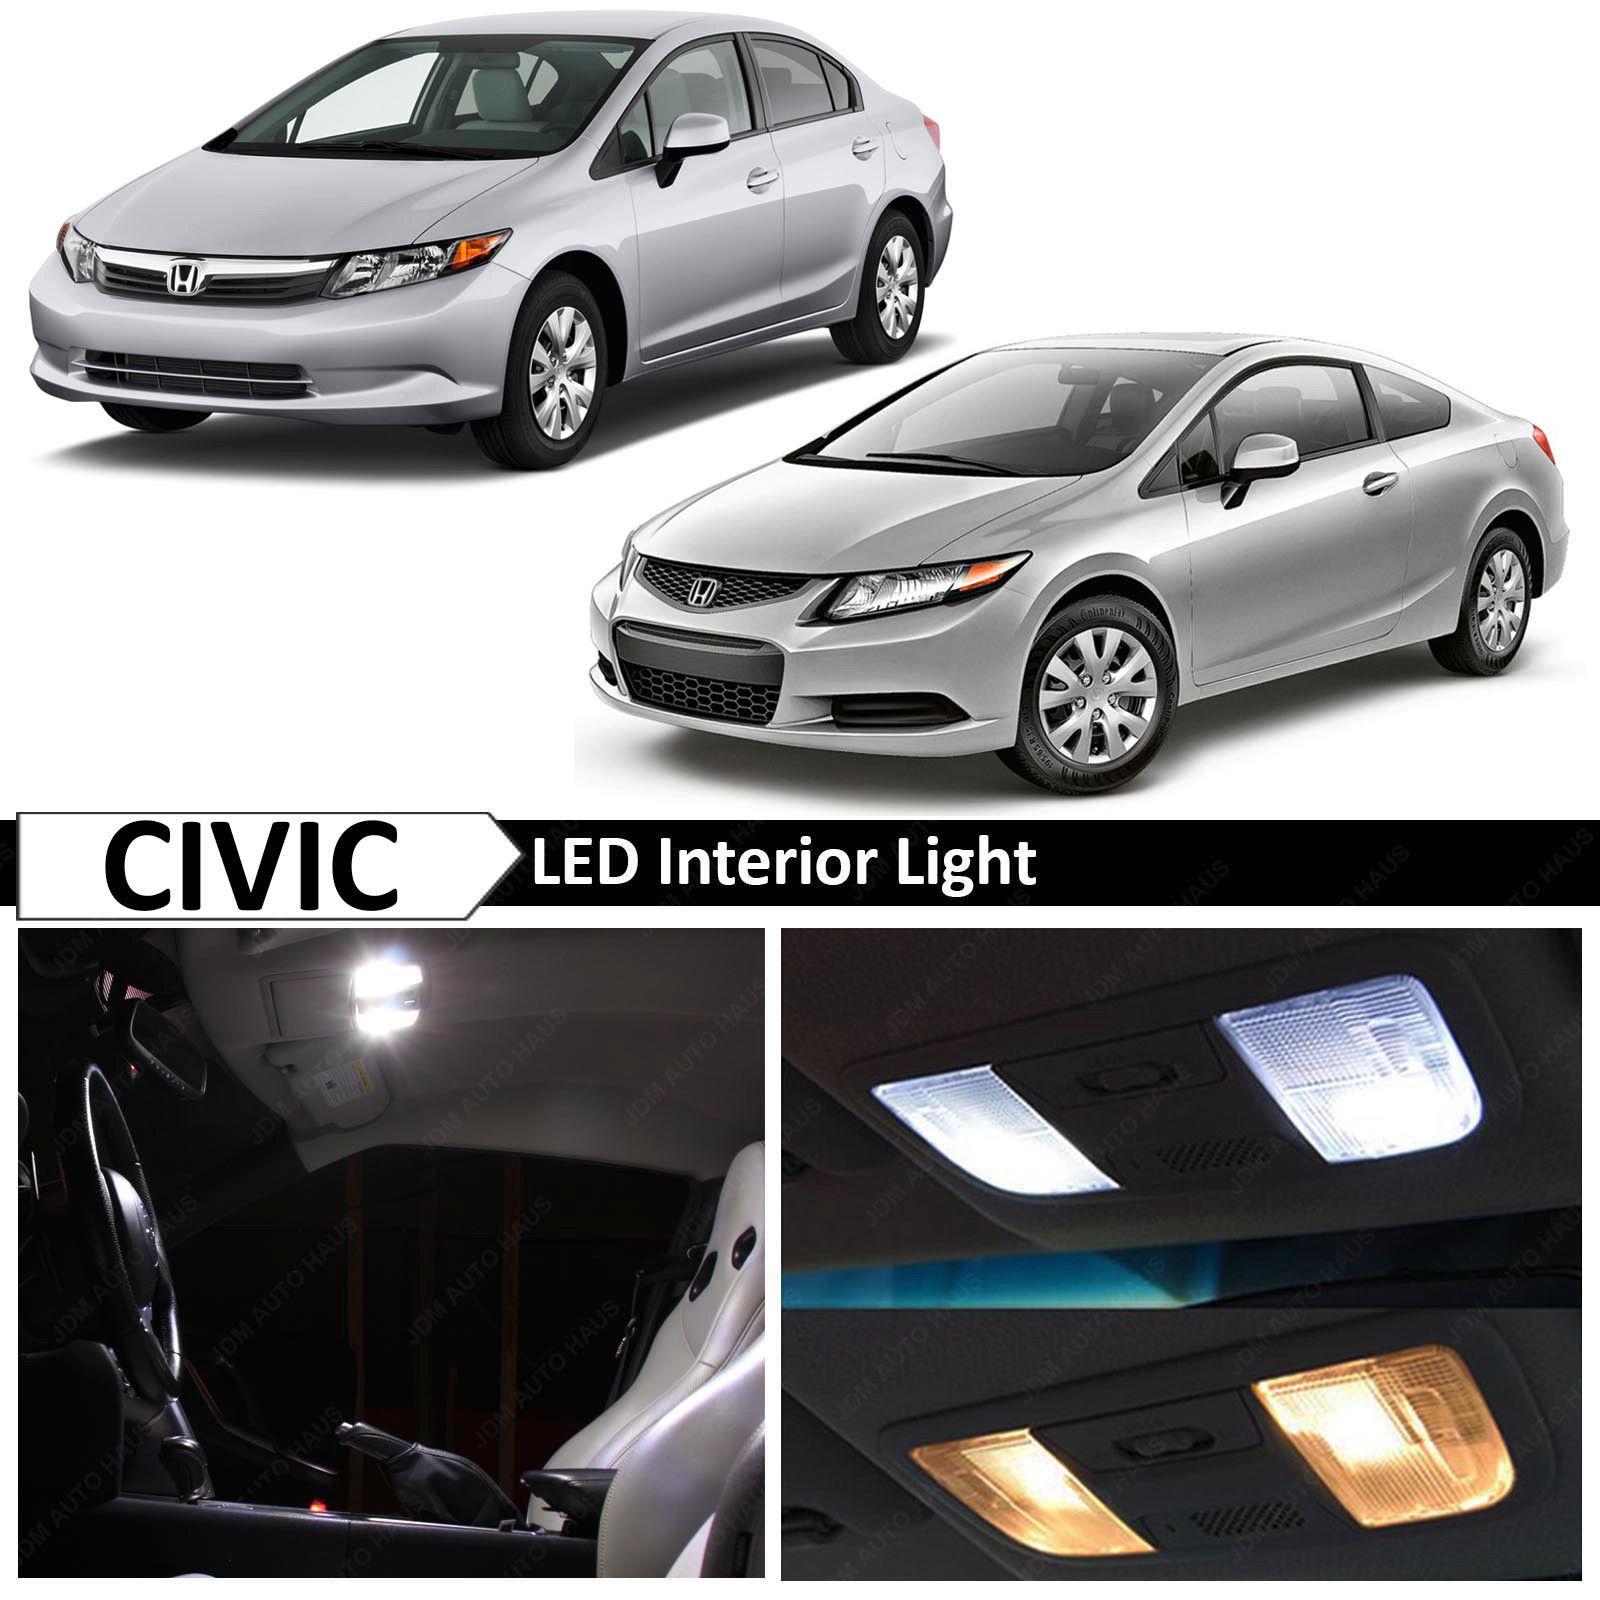 Awesome 8x White Interior Led Light Package Kit Fits Honda Civic 2006 2017 Sedan Coupe 2018